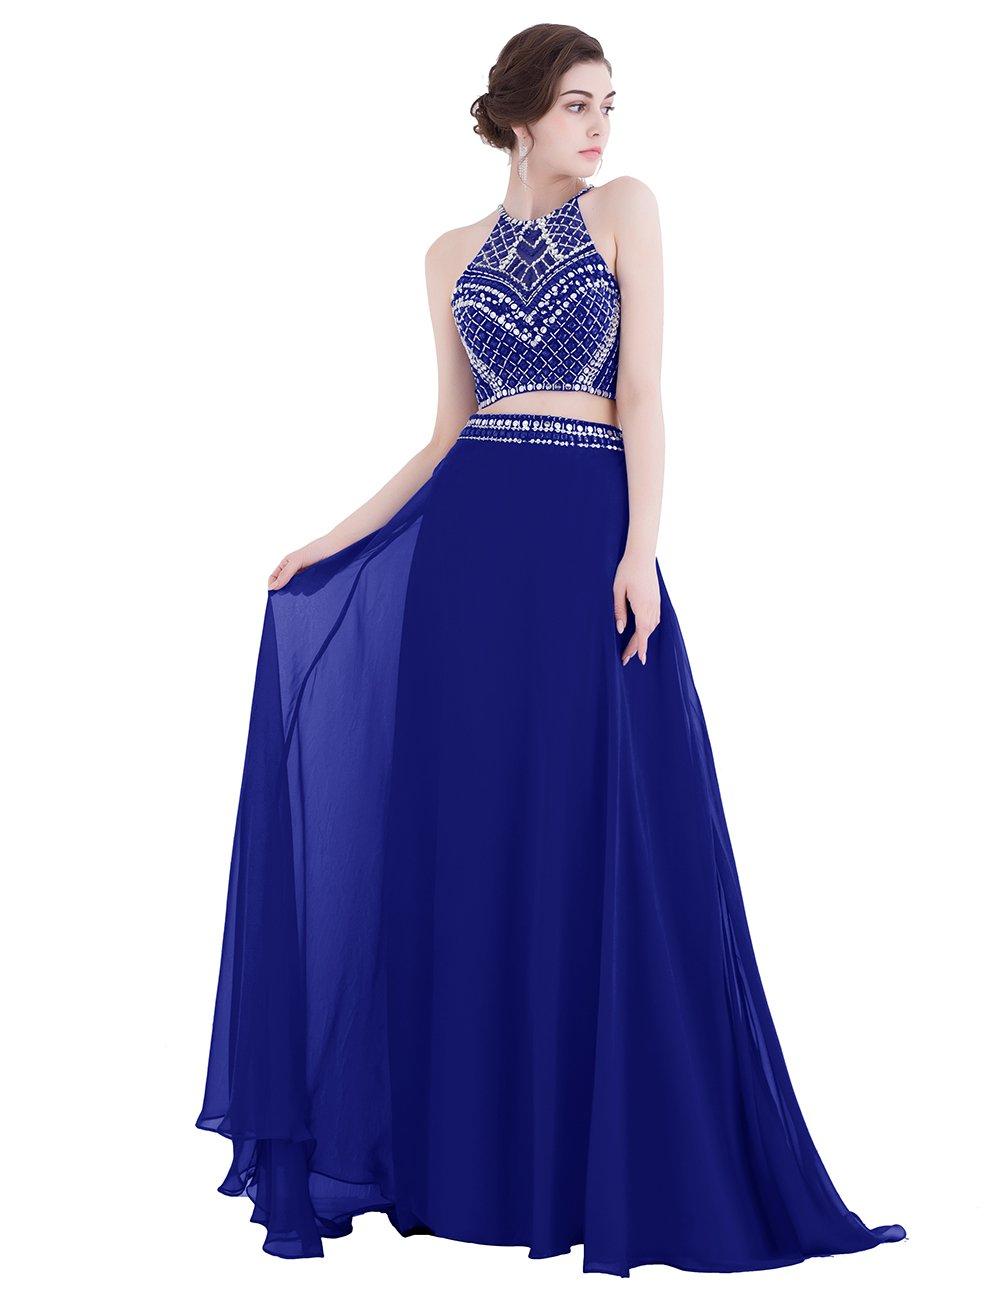 Dresstell(ドレステル) 演奏会ドレス ステージドレス ふんわりシフォン ビジュー付き ツーピースドレス ビスチェタイプ ダンスドレス 袖なし 発表会ドレス プロムドレス B06ZZ7QT9C JP21W ロイヤルブルー ロイヤルブルー JP21W